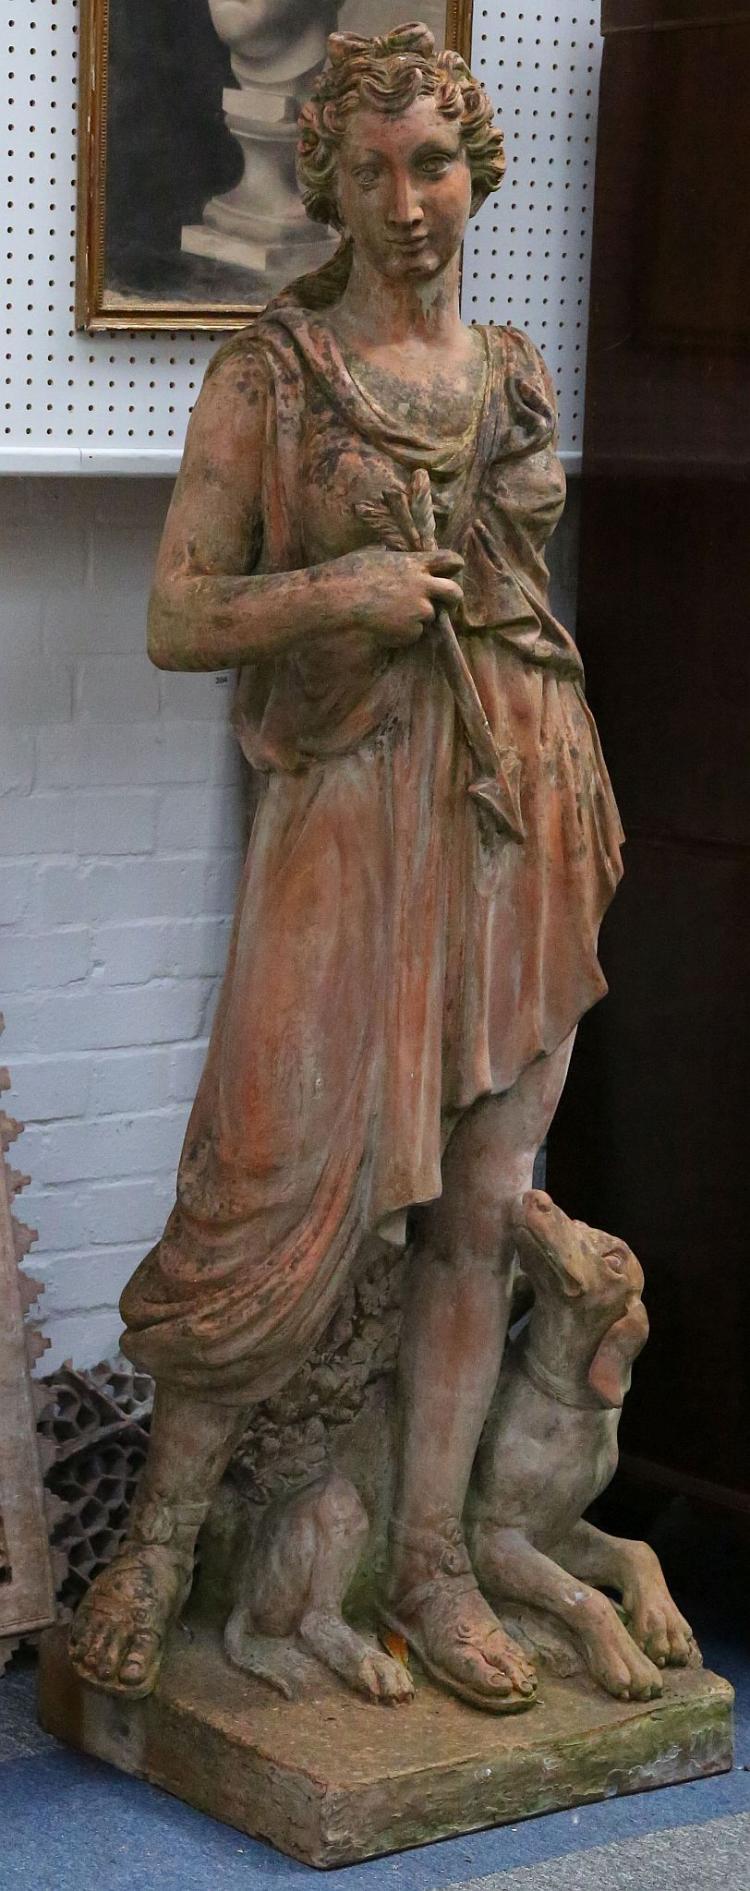 A pair of 19th Century terracotta garden statues of Artemis